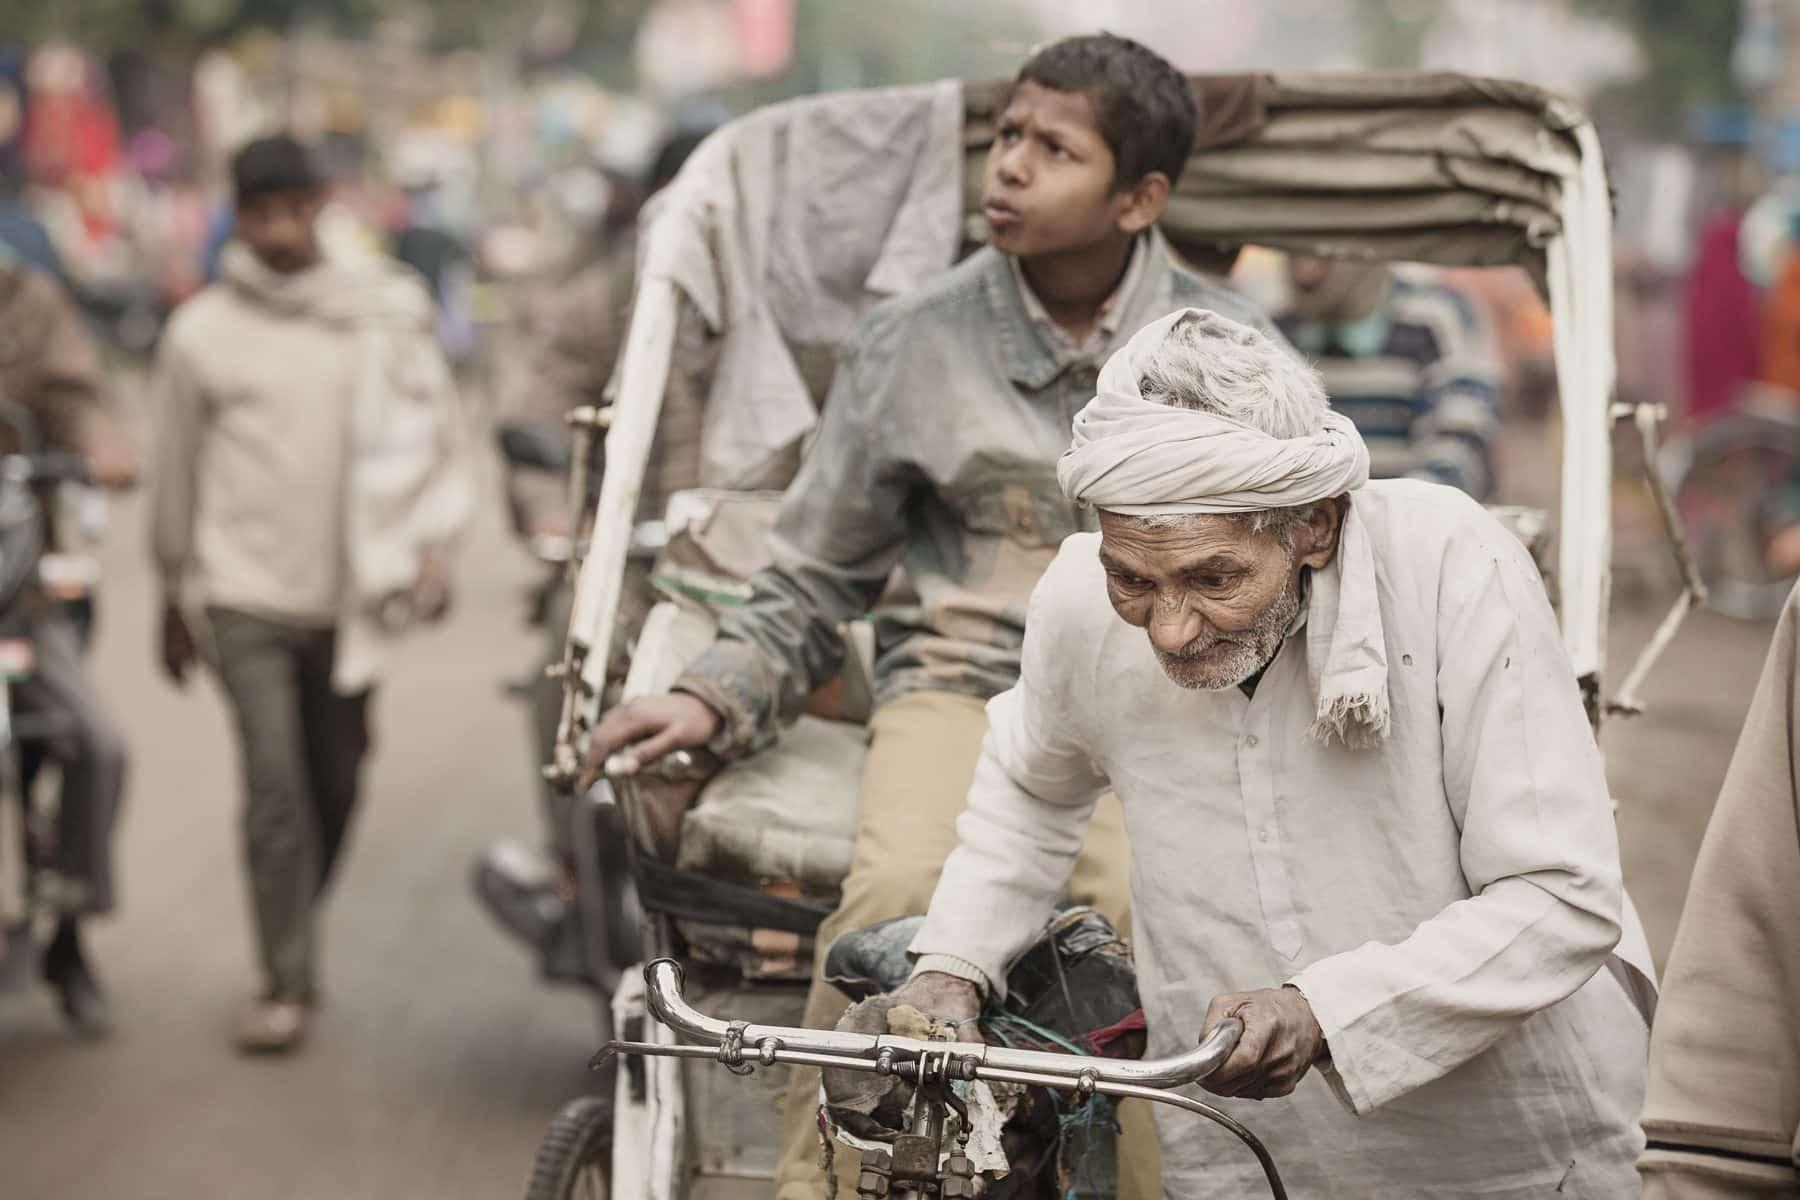 India, Varanasi, Street, bicycle rickshaw india